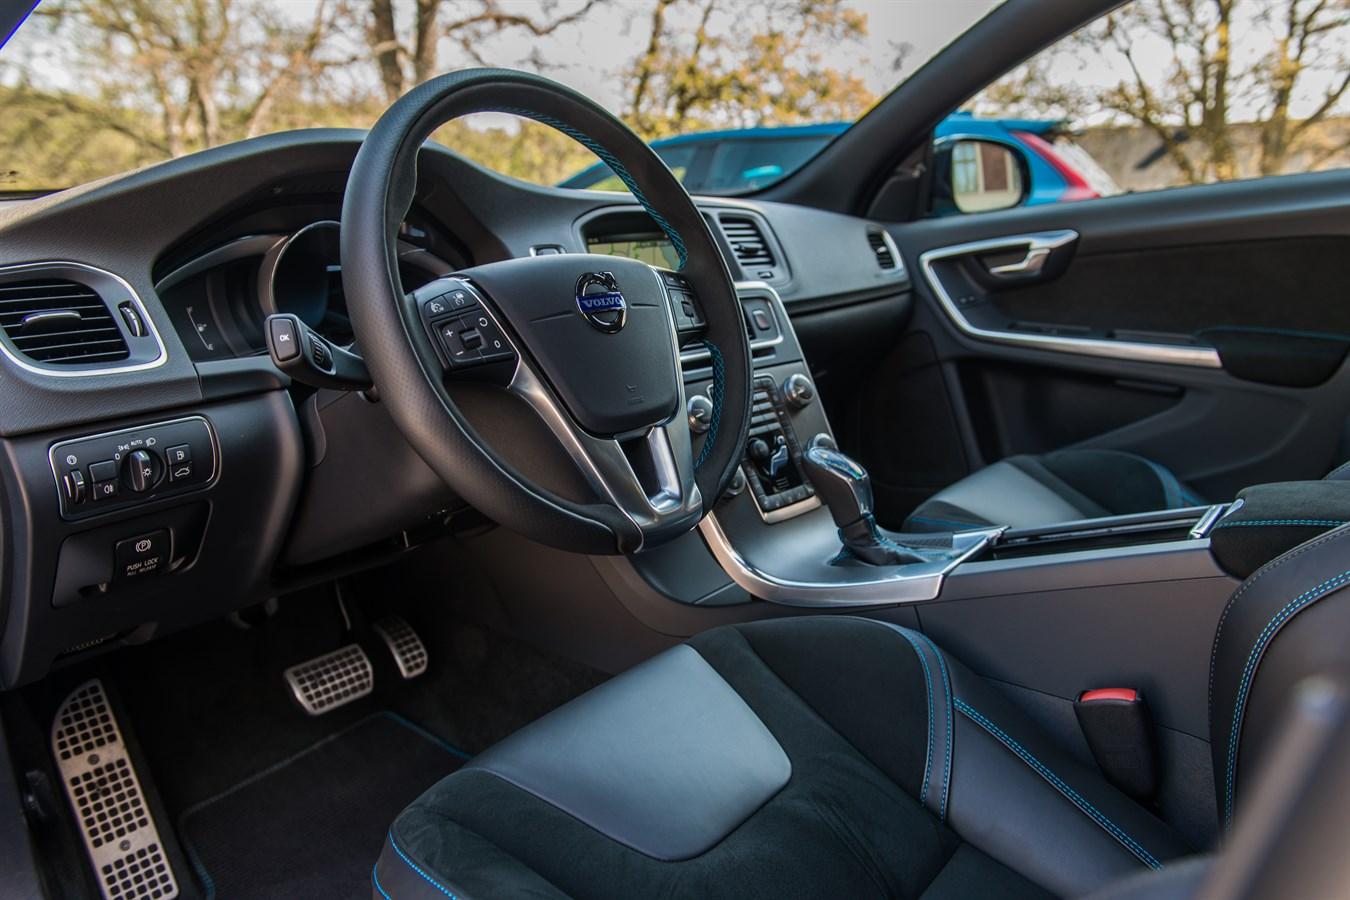 Volvo S60 and V60 Polestar interior - Volvo Car UK Media Newsroom